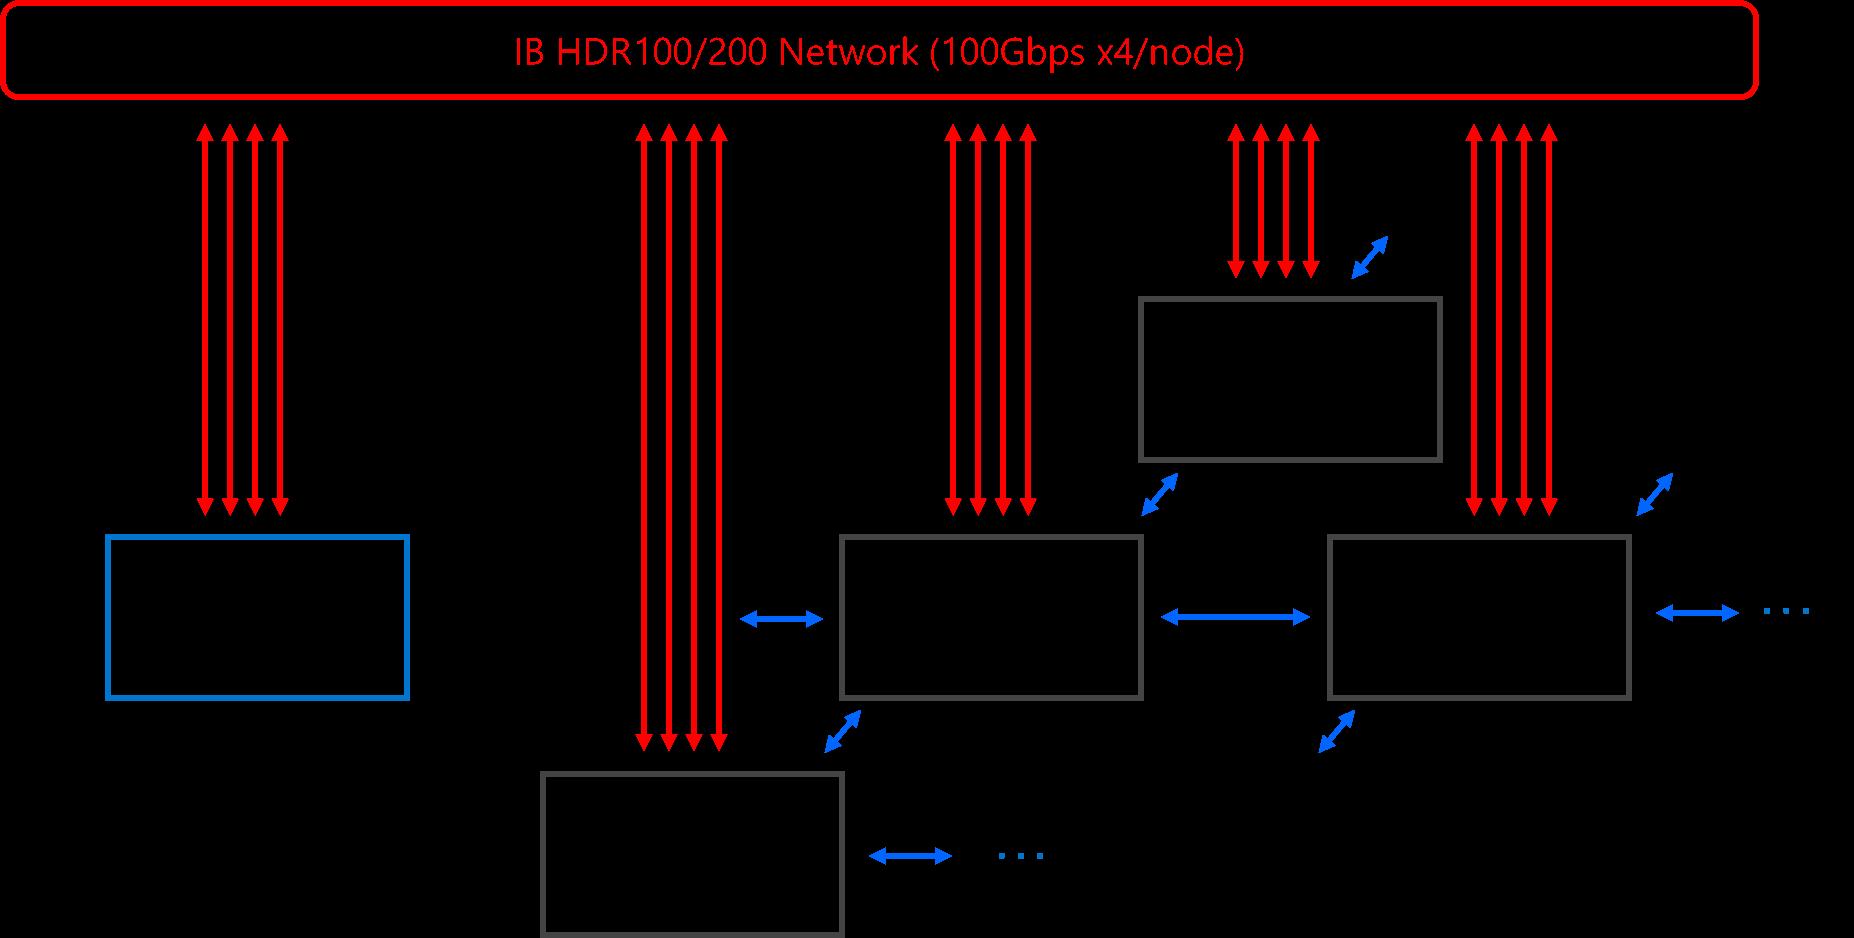 cygnusのアーキテクチャ infiniBand